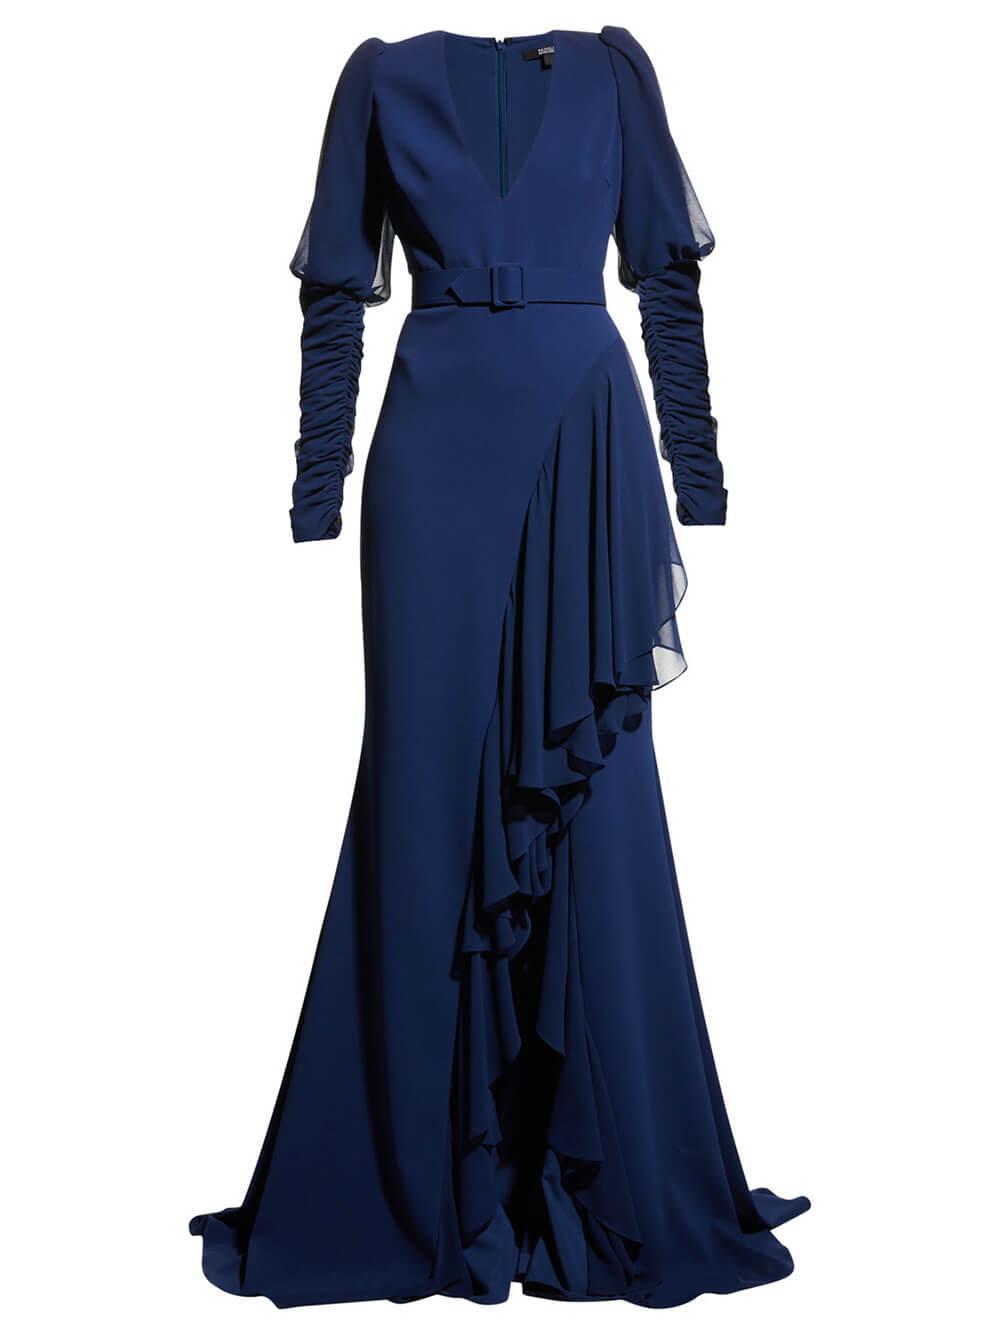 Ruffle Hem Belted Gown Item # EG3209